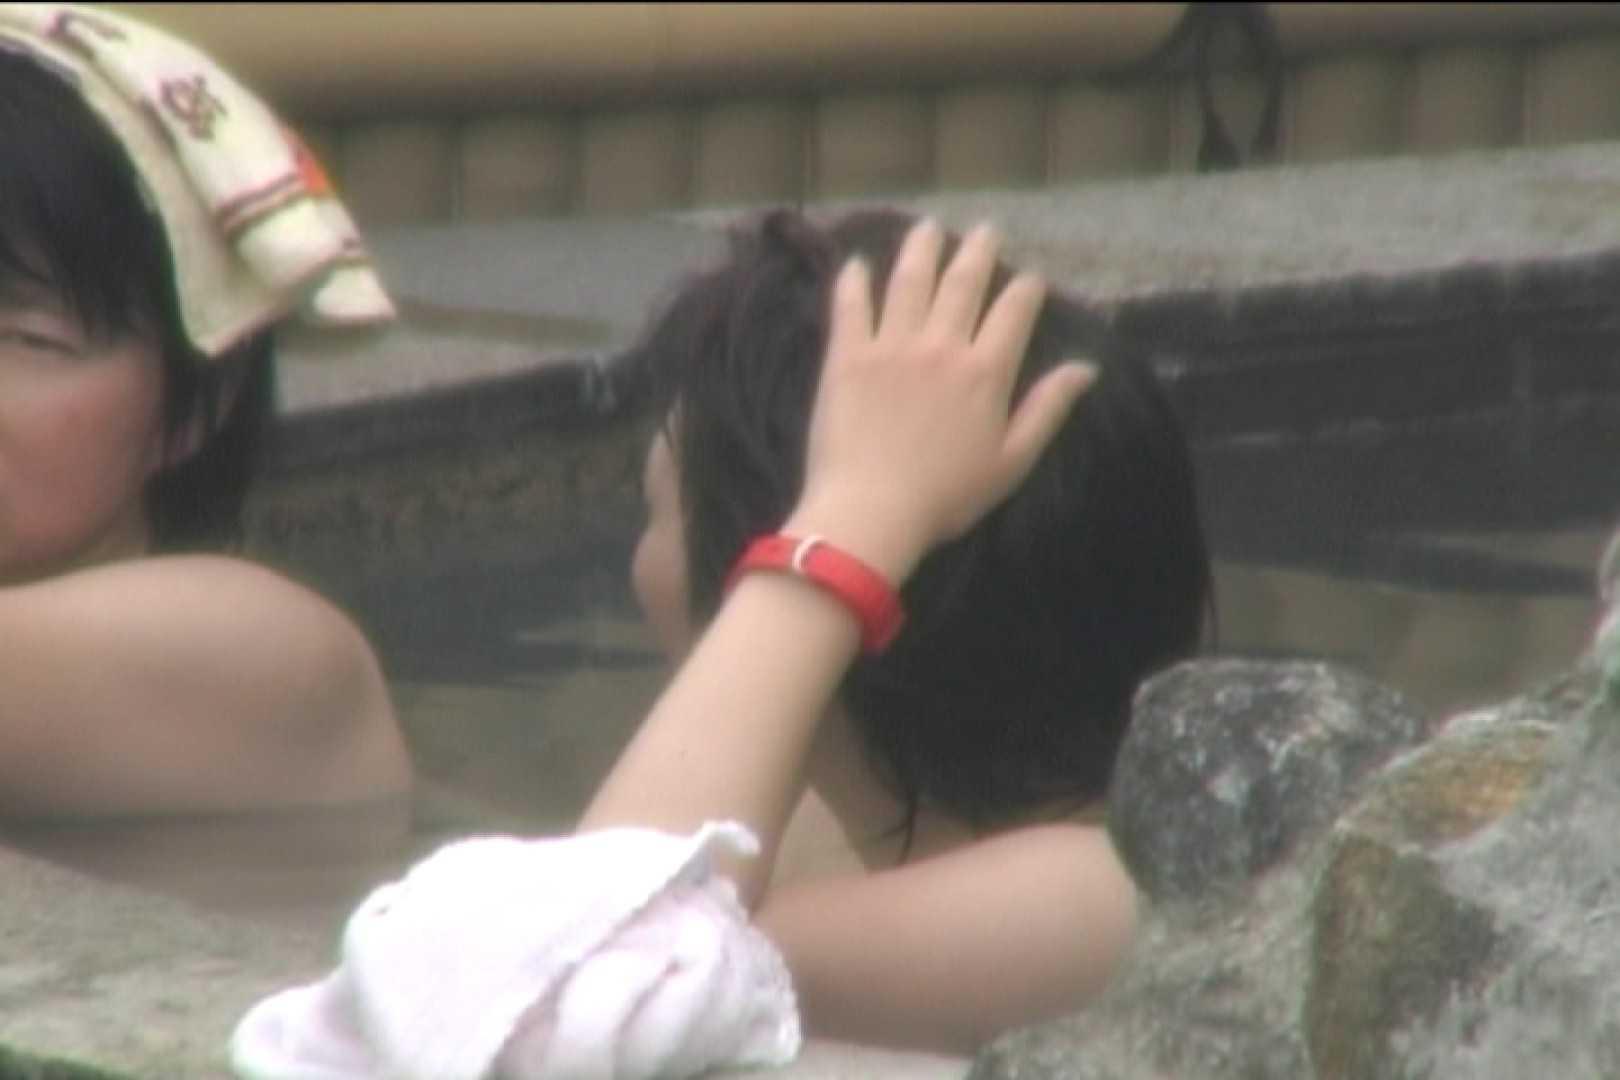 Aquaな露天風呂Vol.122 露天風呂編  92PIX 78